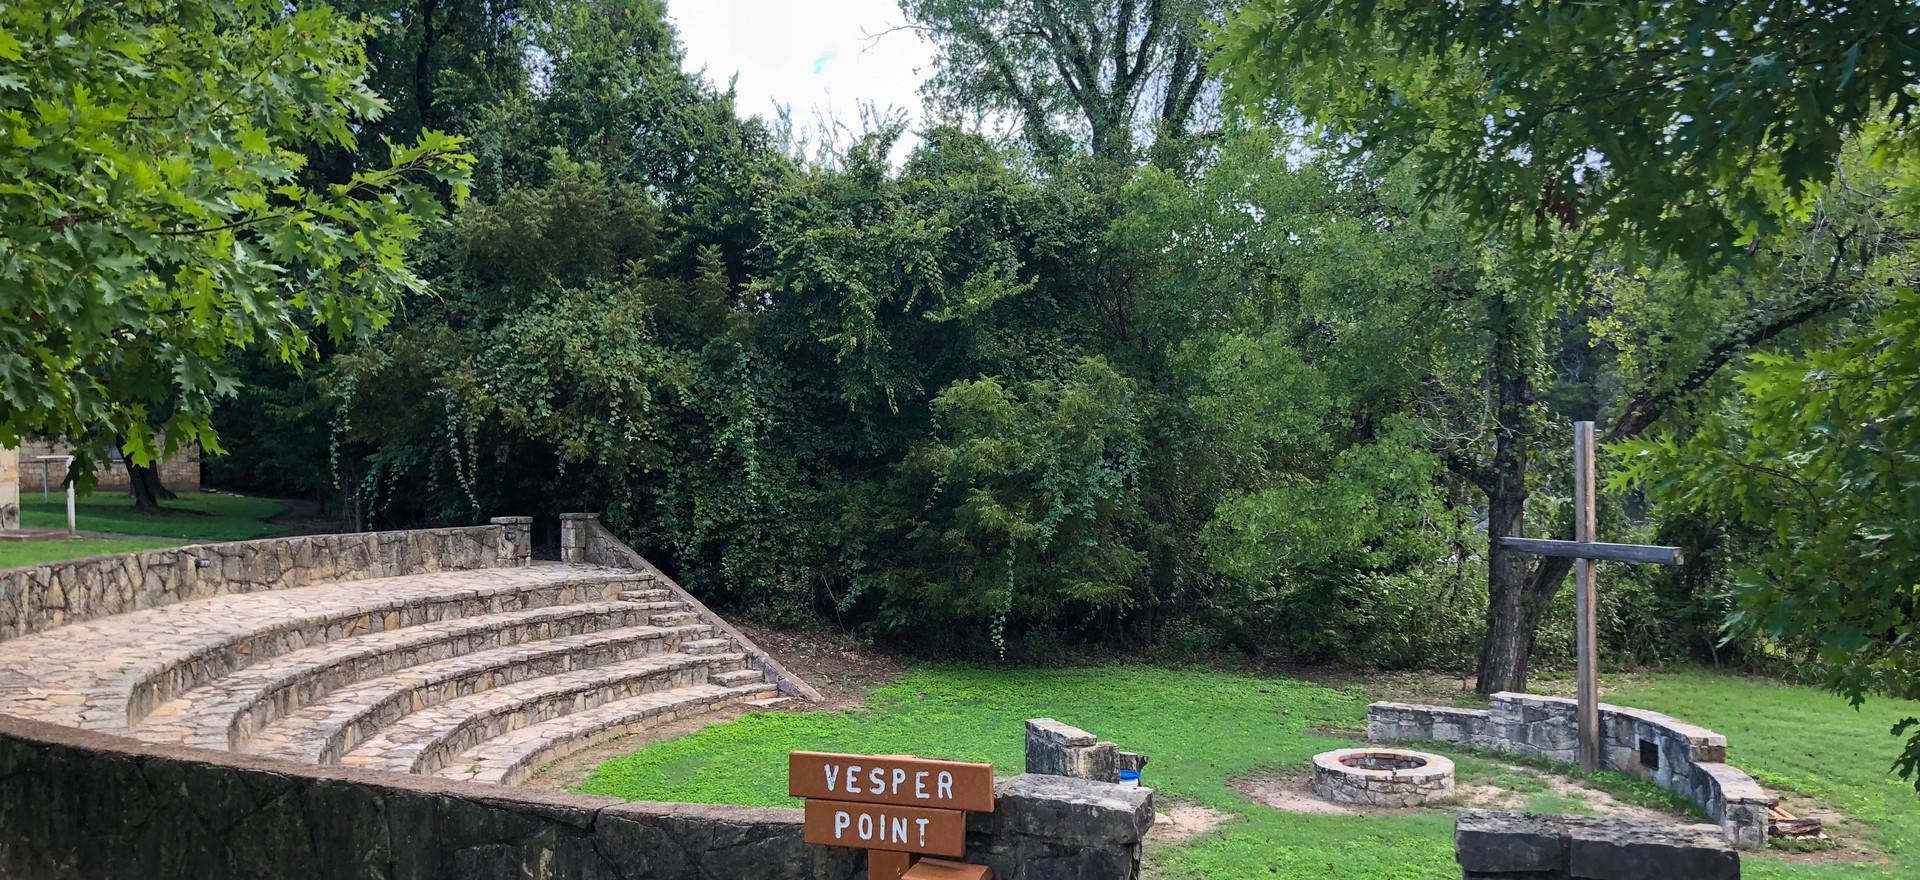 Vesper's Point | Glen Lake Camp and Retreat Center